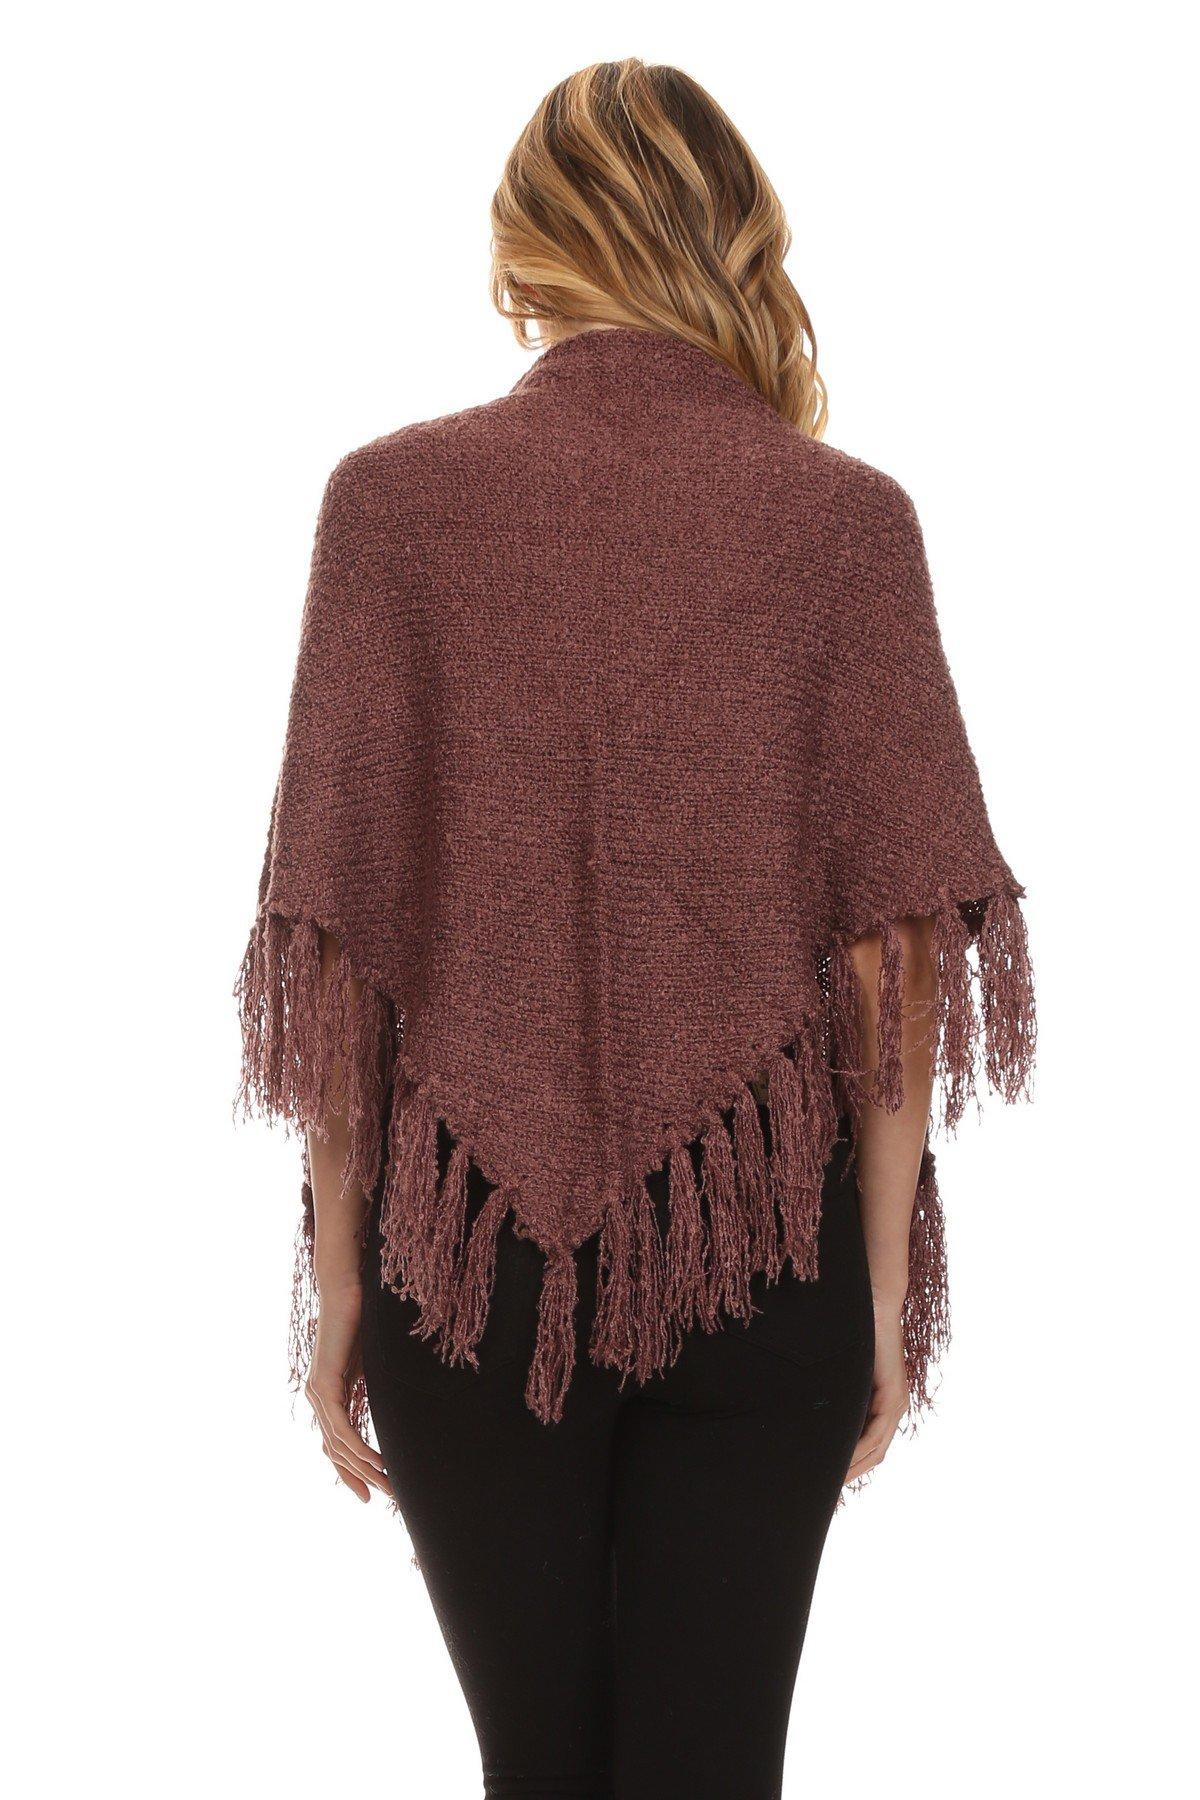 ICONOFLASH Women's Casual Sweater Knit Fringed Fashion Scarf Wrap, Mauve by ICONOFLASH (Image #4)